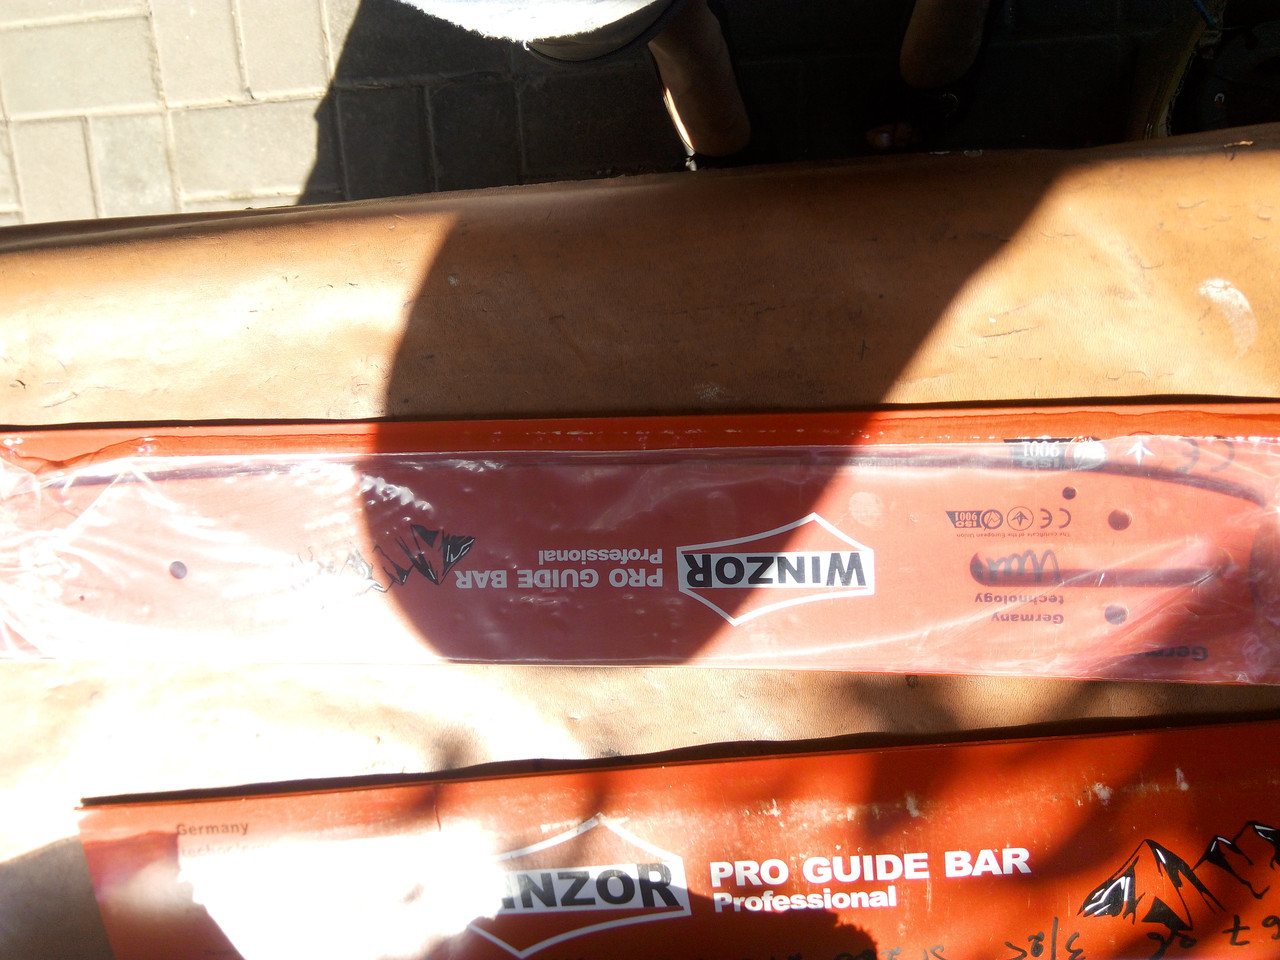 "Шина Winzor 16""(40 см) 325 ,67зв. к бензопиле STIHL 260,270,280"